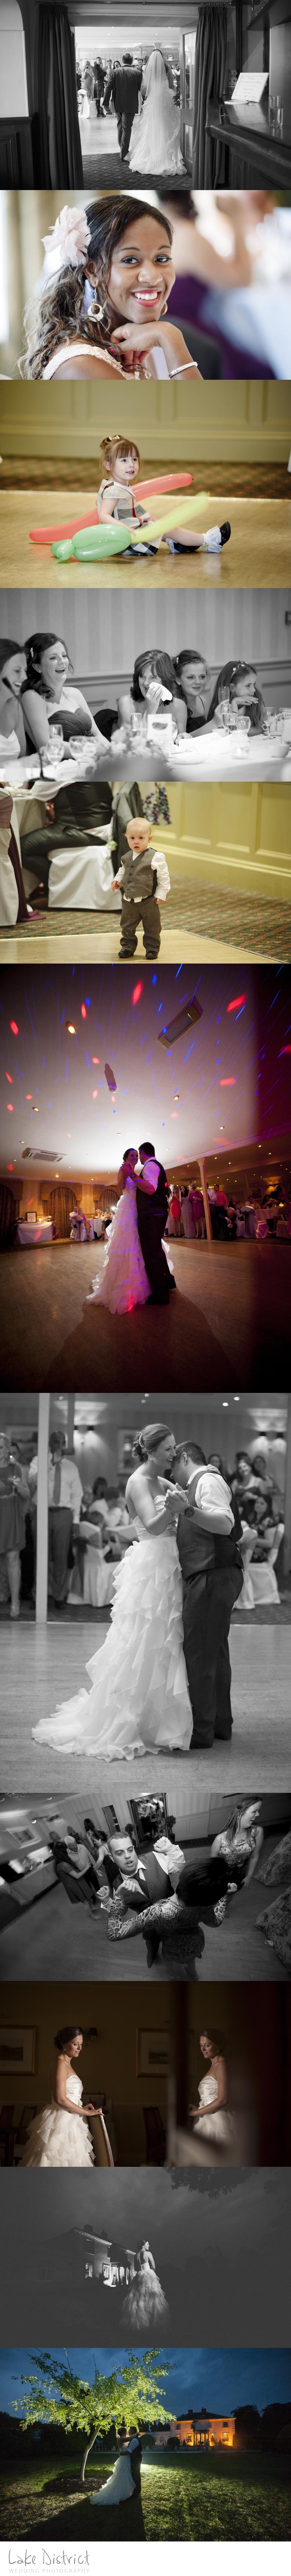 Wedding Photographers Penrith and Keswick